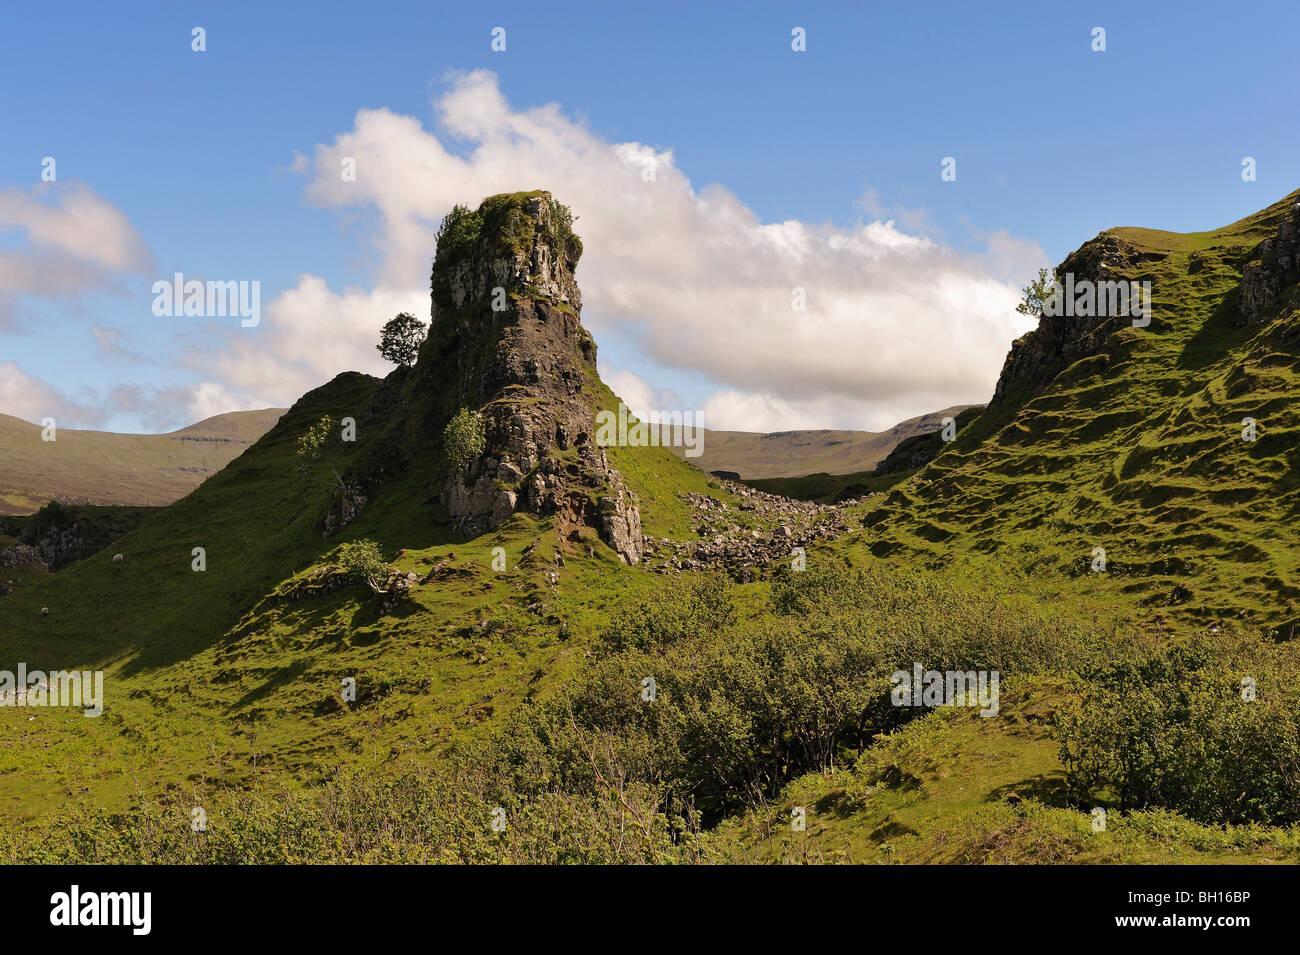 Unique basalt stack or pinnacle in Glen Uig, Trotternish, Isle of Skye, Scottish Highlands, UK. - Stock Image